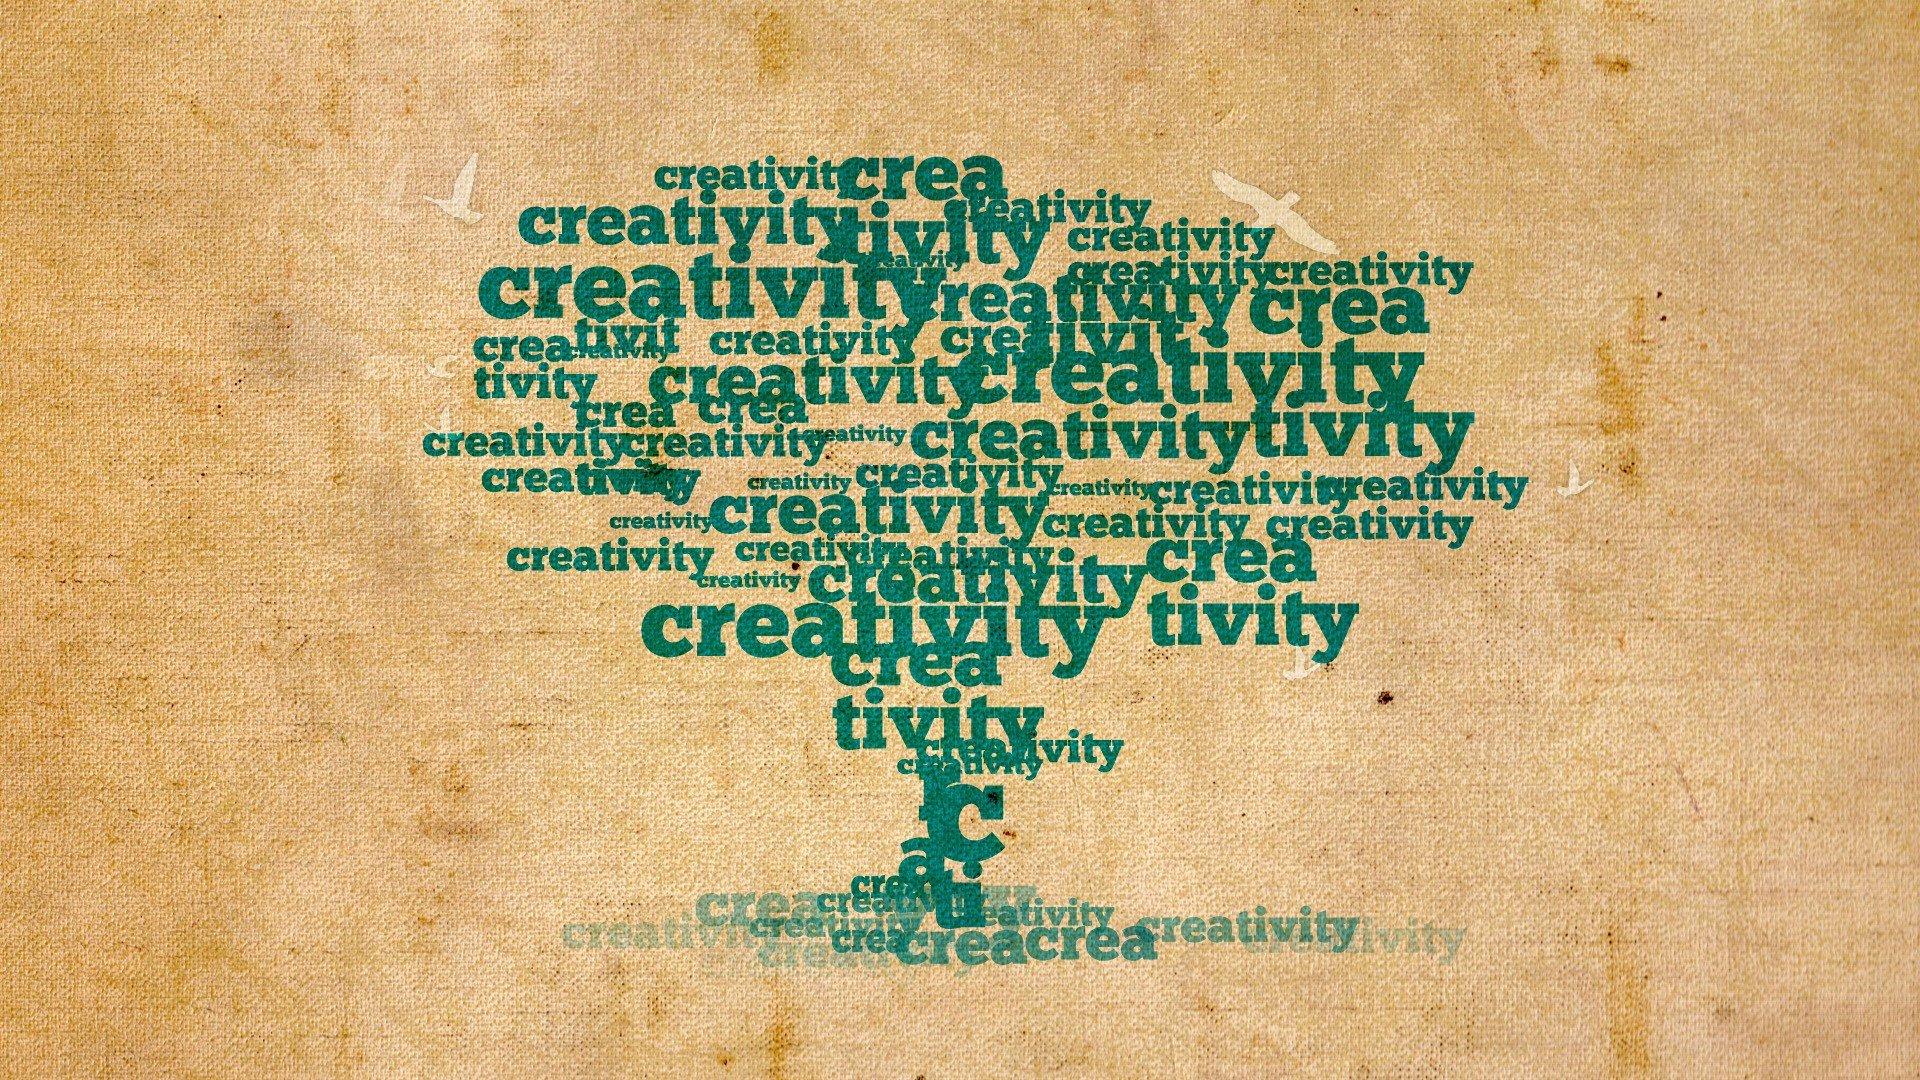 Wallpaper 1920x1080 Px Creativity Phrase Proverb